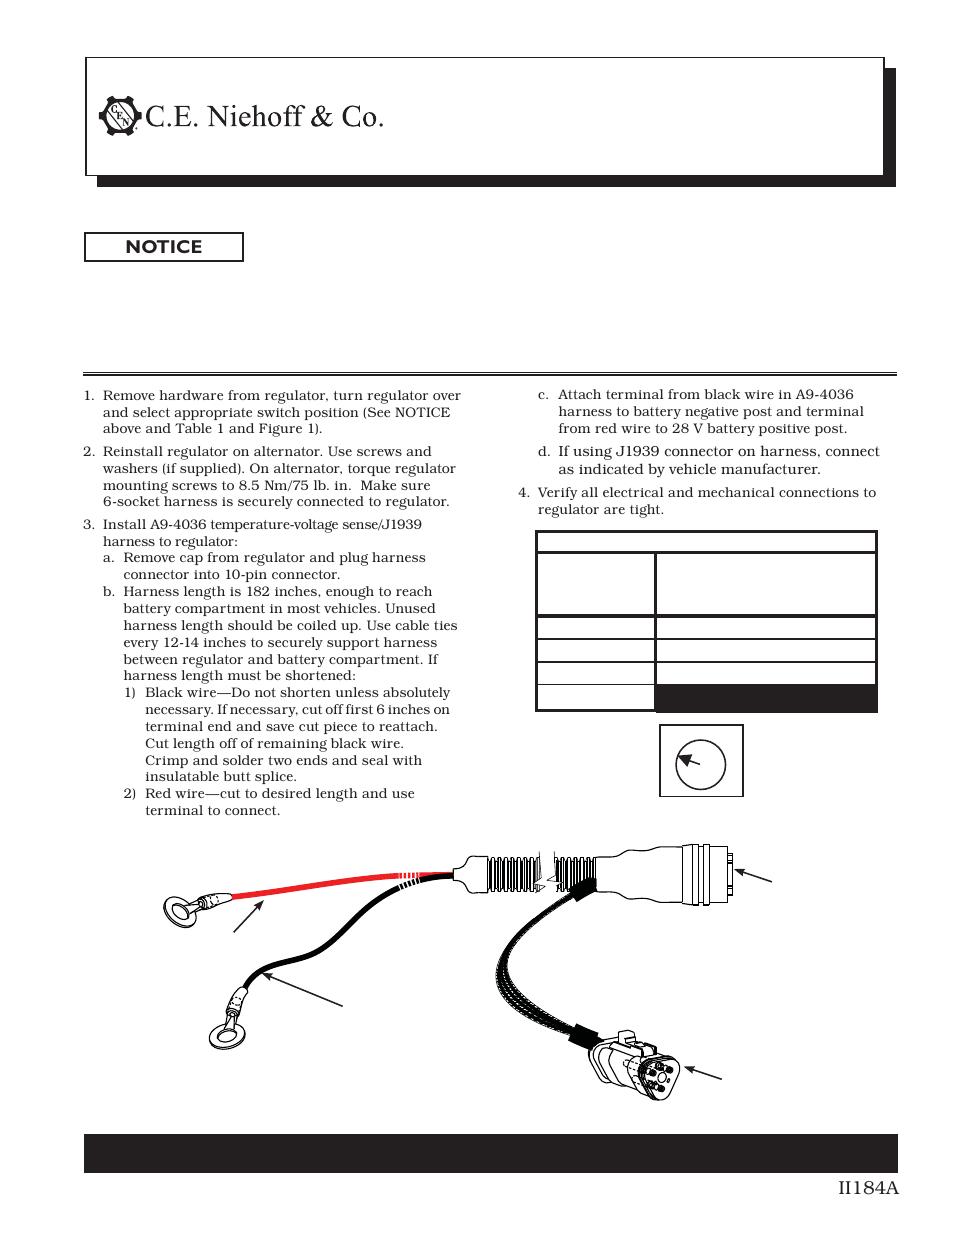 medium resolution of a9 4036 tv j1939 harness installation user manual 1 page